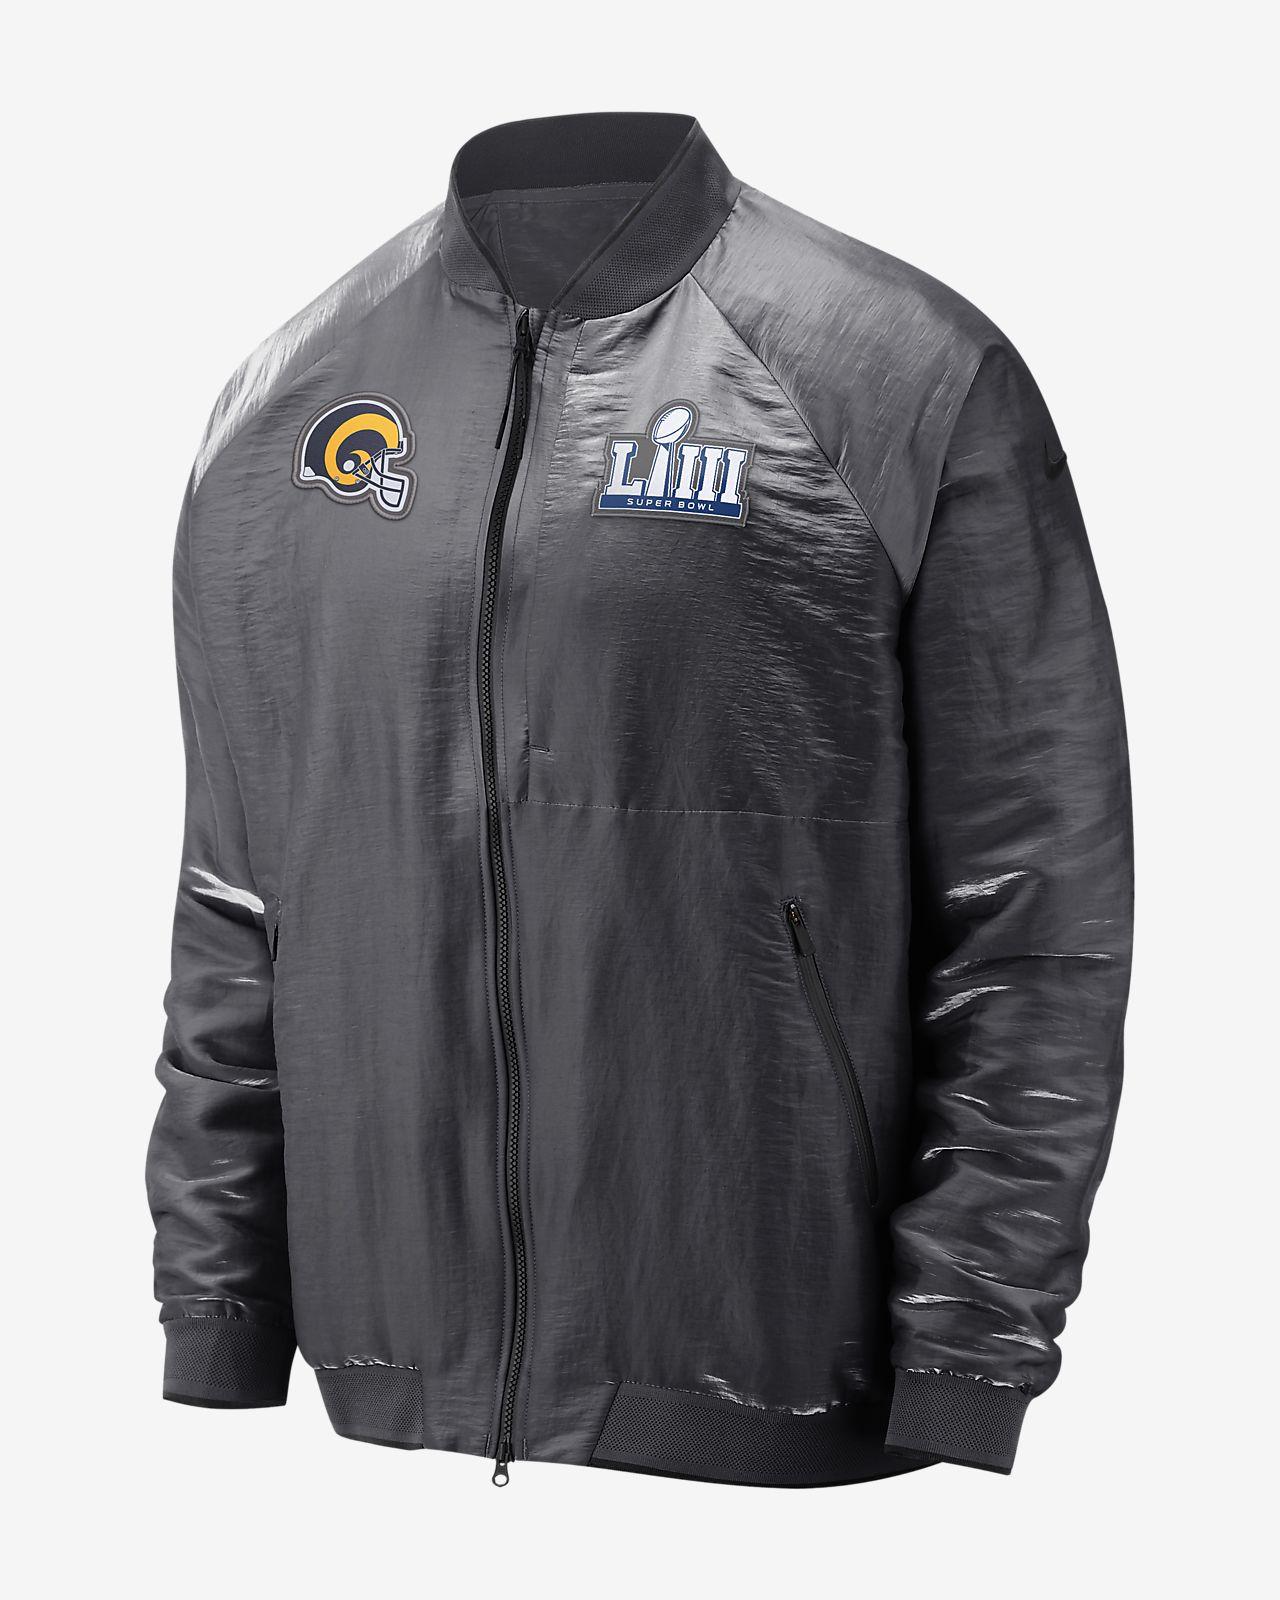 418c7beb69fd Nike Super Bowl LIII (NFL Rams) Men s Bomber Jacket. Nike.com